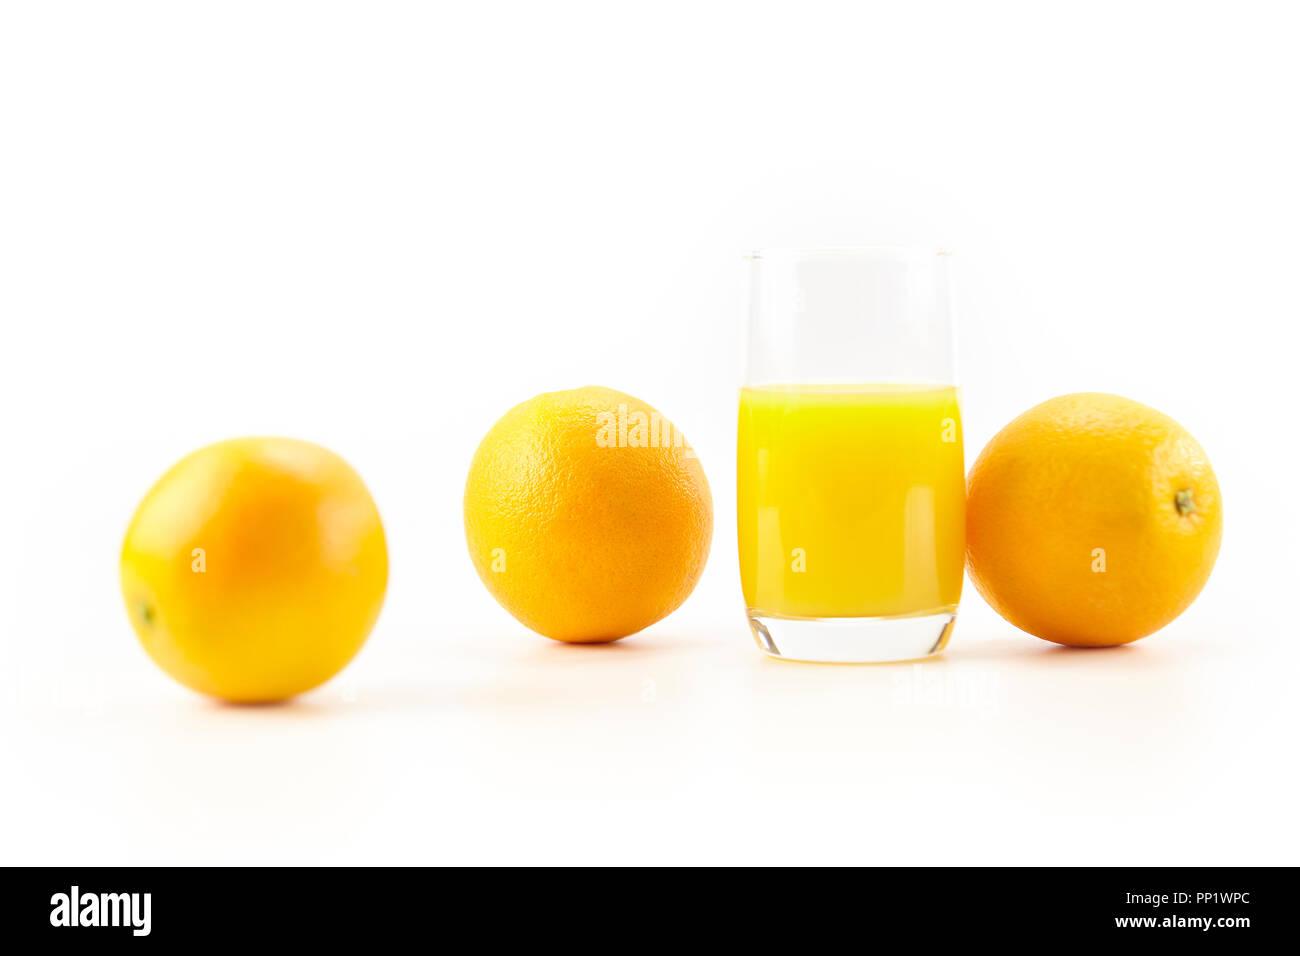 three oranges and a glass of orange juice isolated on white background. - Stock Image